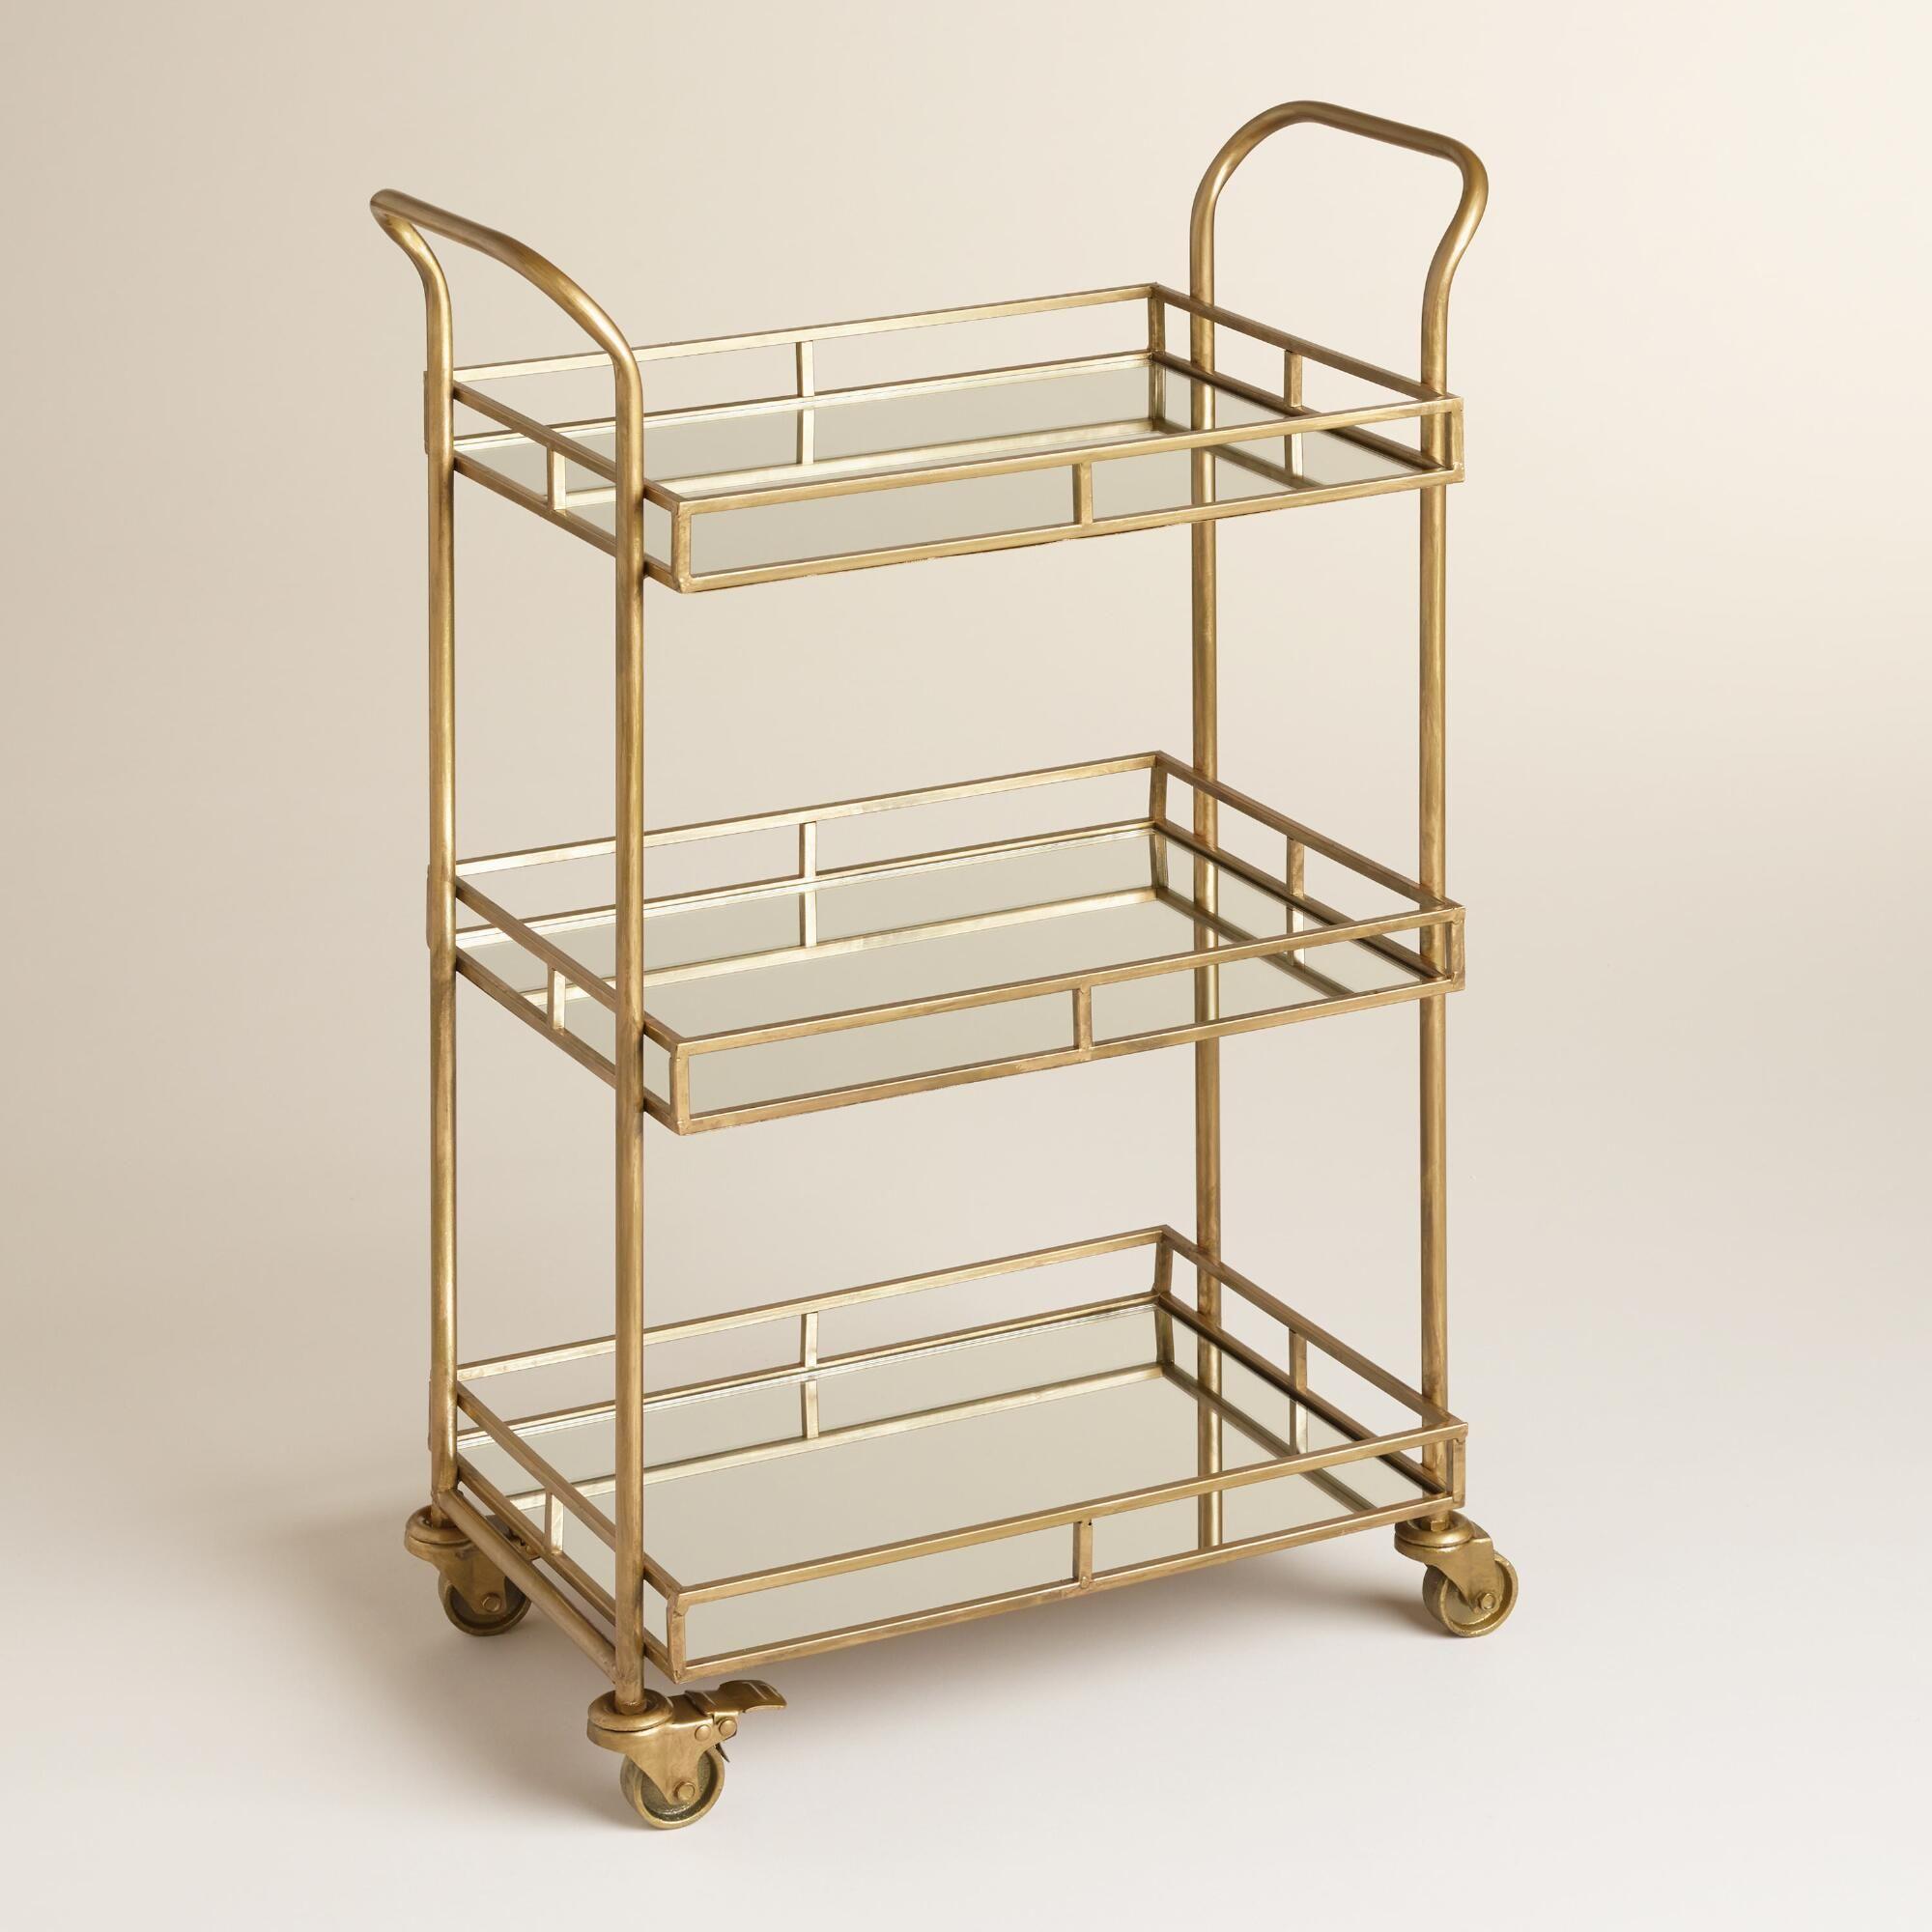 Kitchen island cart world market - Gold Cole 3 Tier Rolling Bar Cart